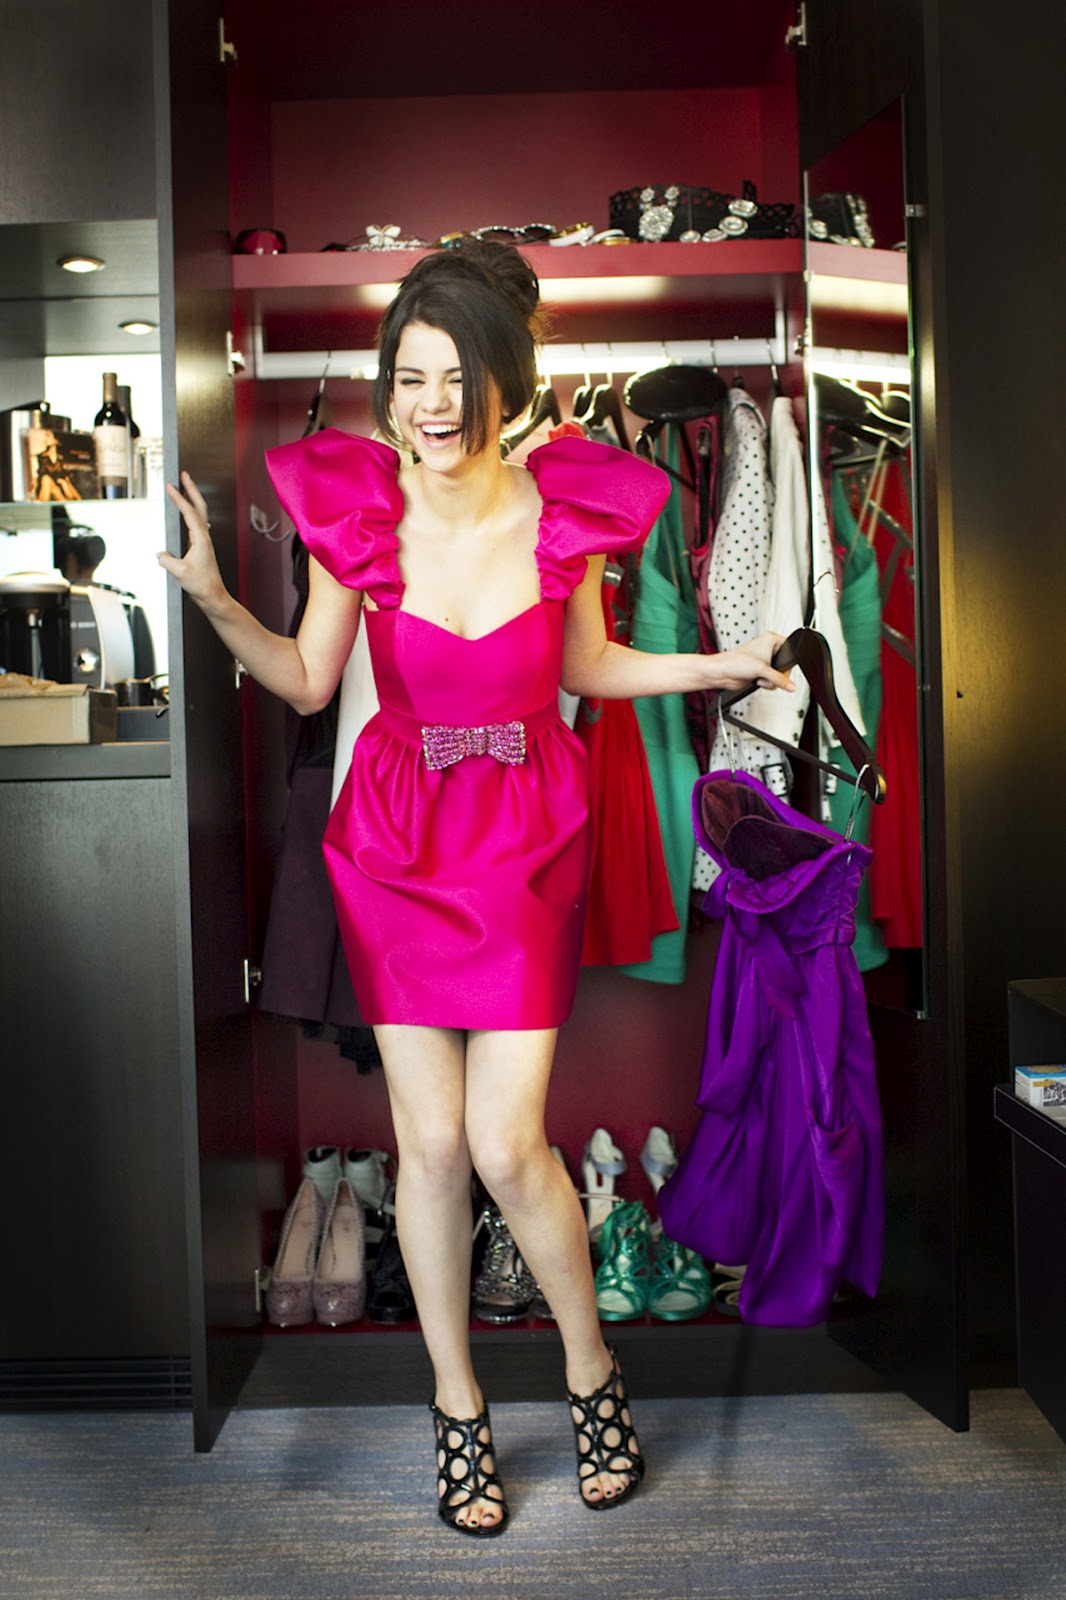 Gomez Selena stylish in pink